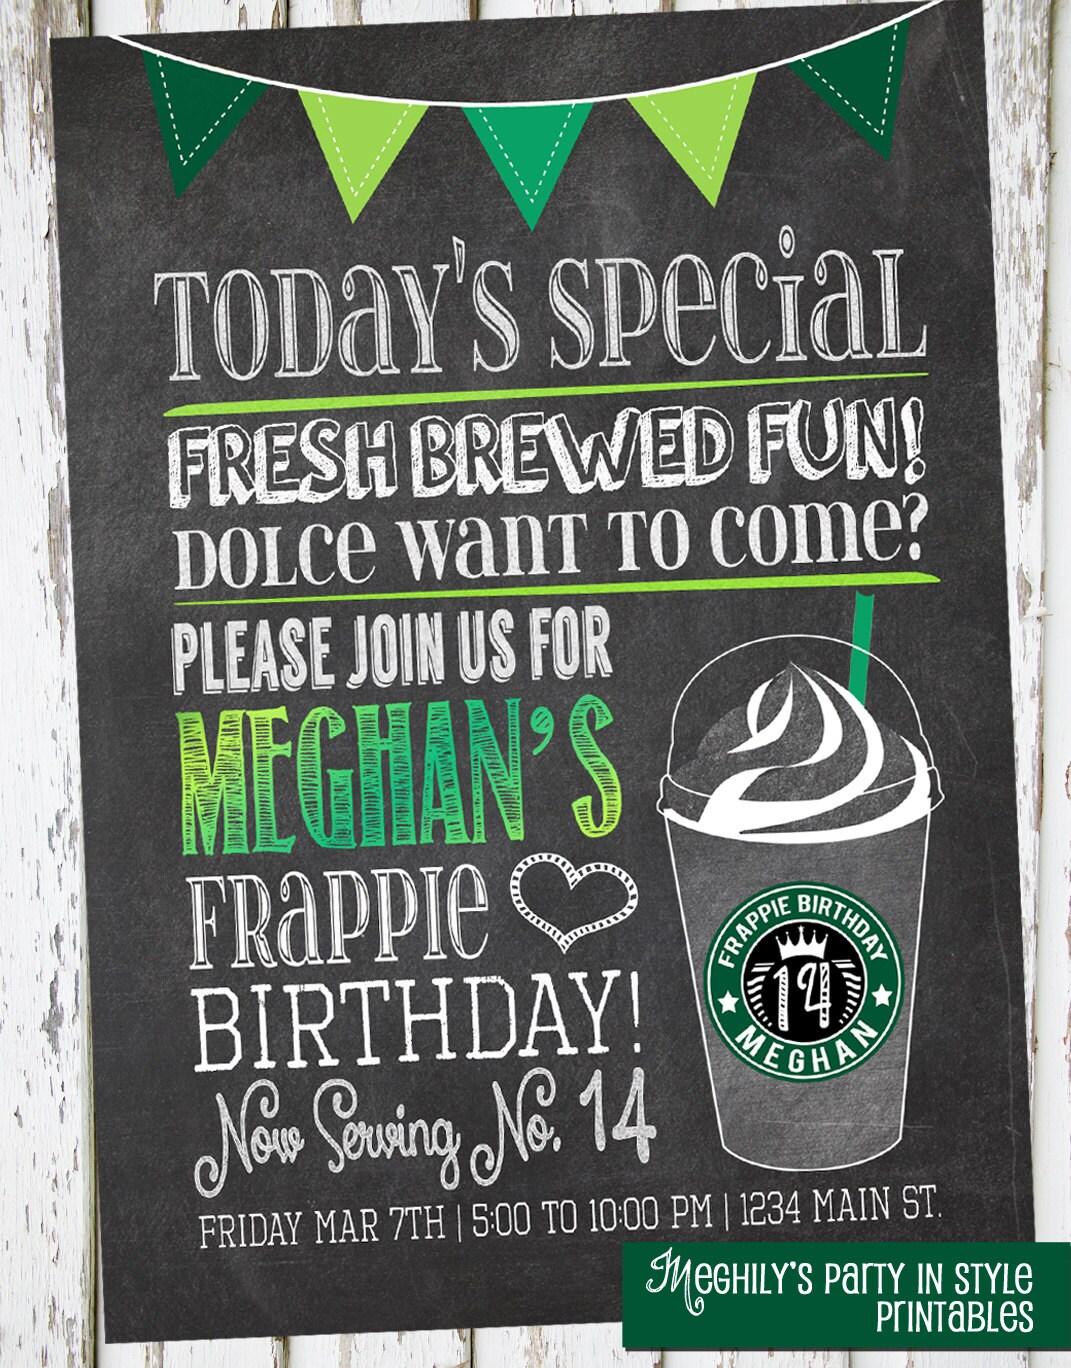 Free Birthday Starbucks ~ Starbucks inspired invitation by meghily s catch my party